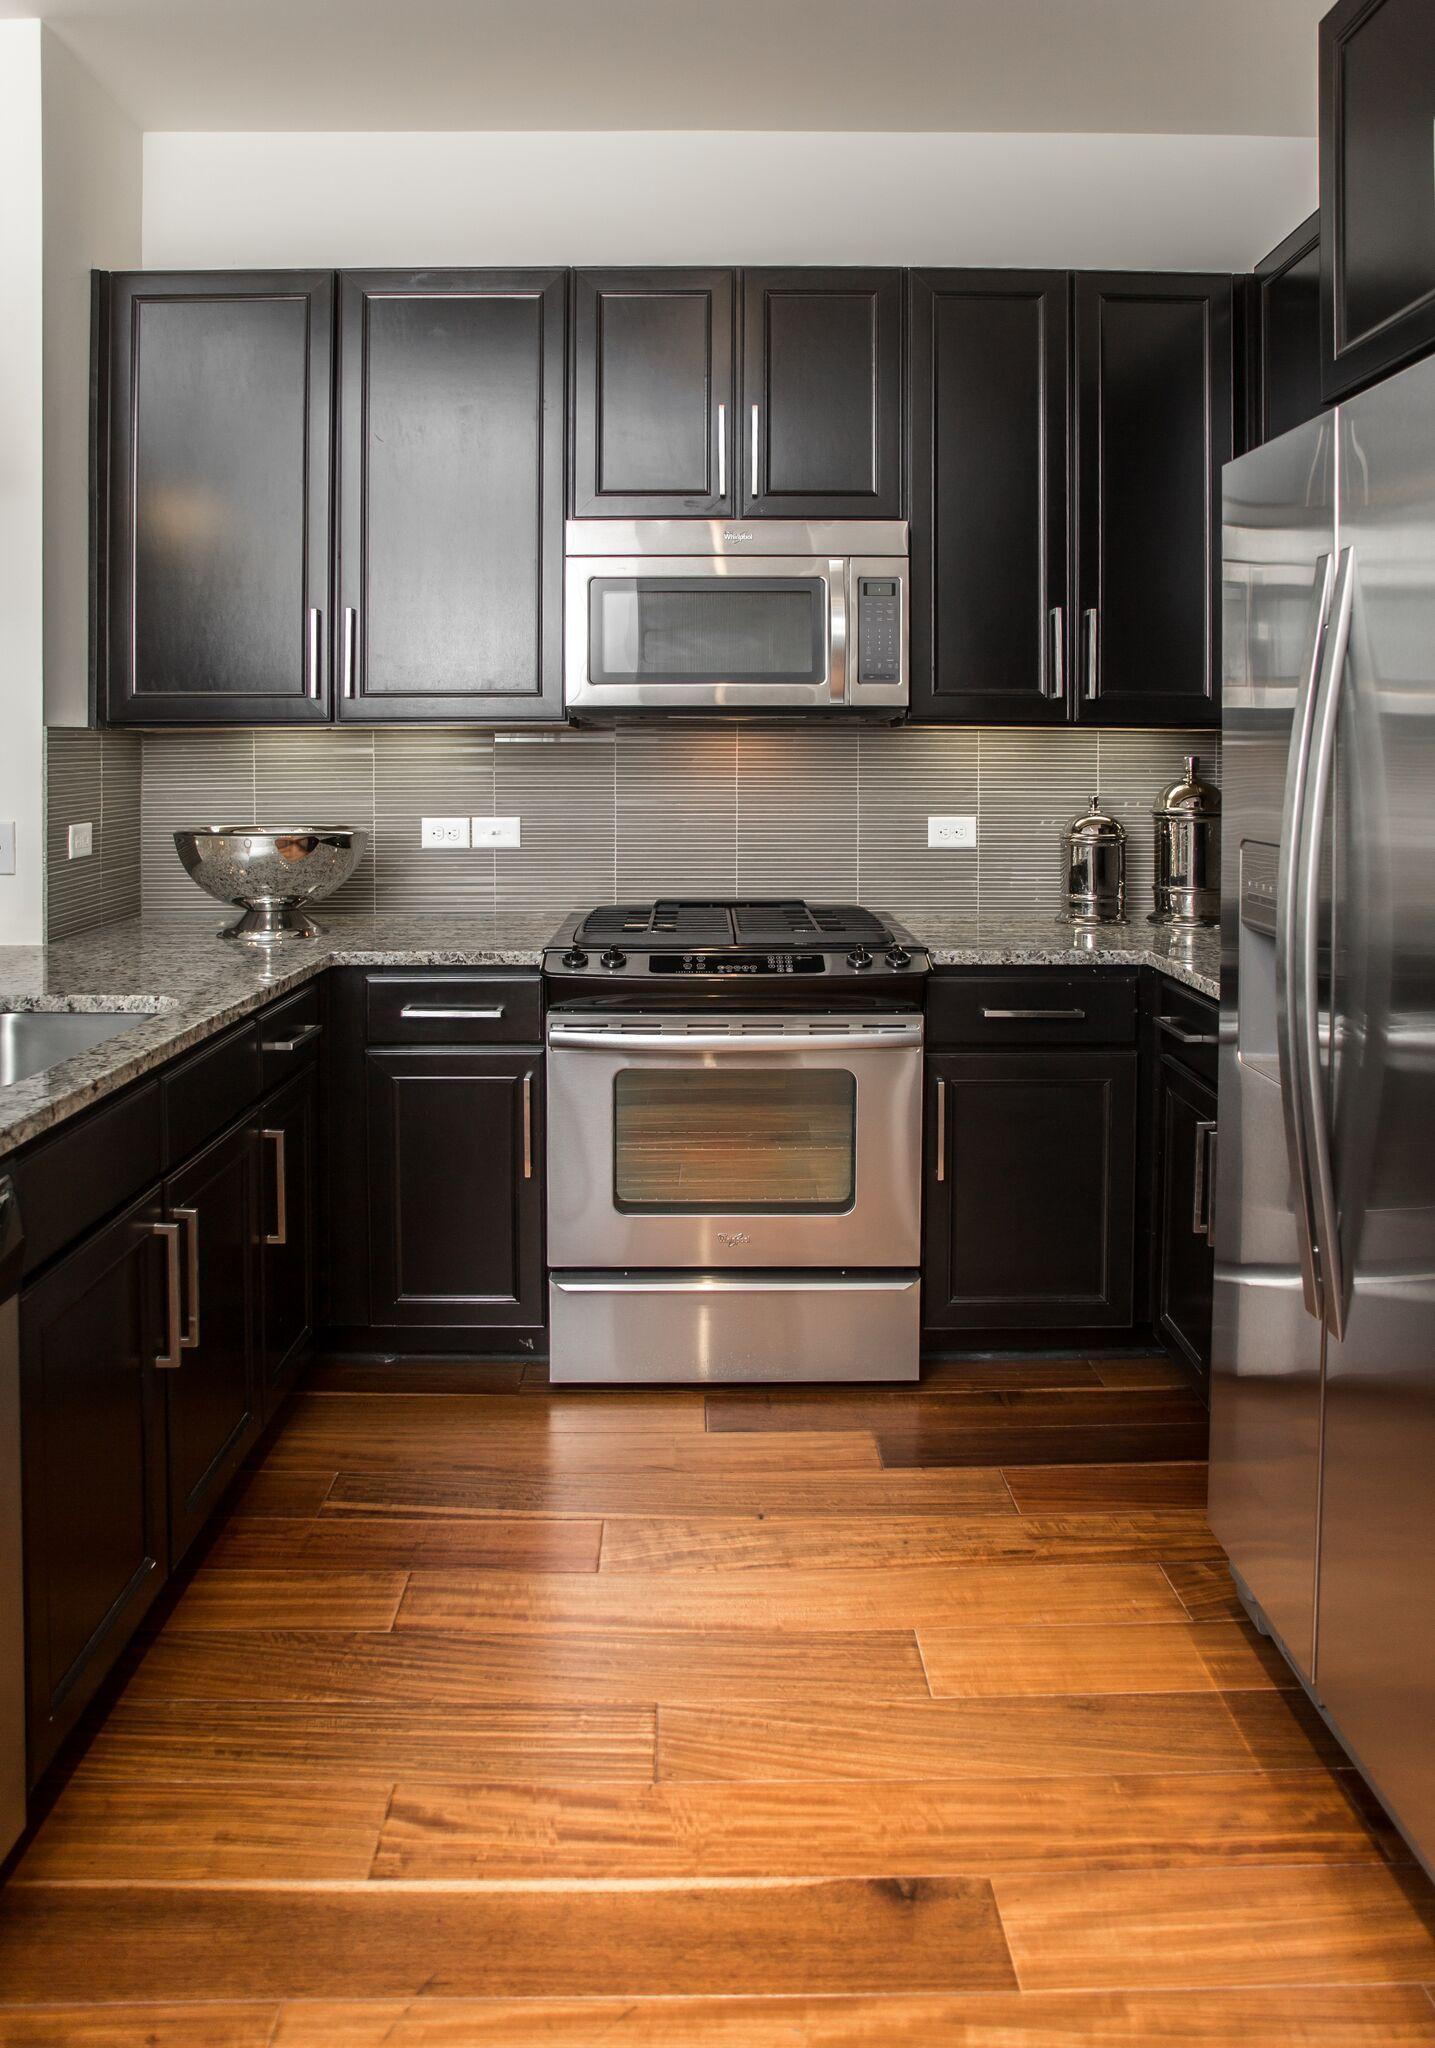 Pearl21eleven Project In Houston Tx Woodflooring Bgtinteriorsolutions Bgtis Cheap Kitchen Cabinets Kitchen Cabinet Remodel Kitchen Cabinets Home Depot